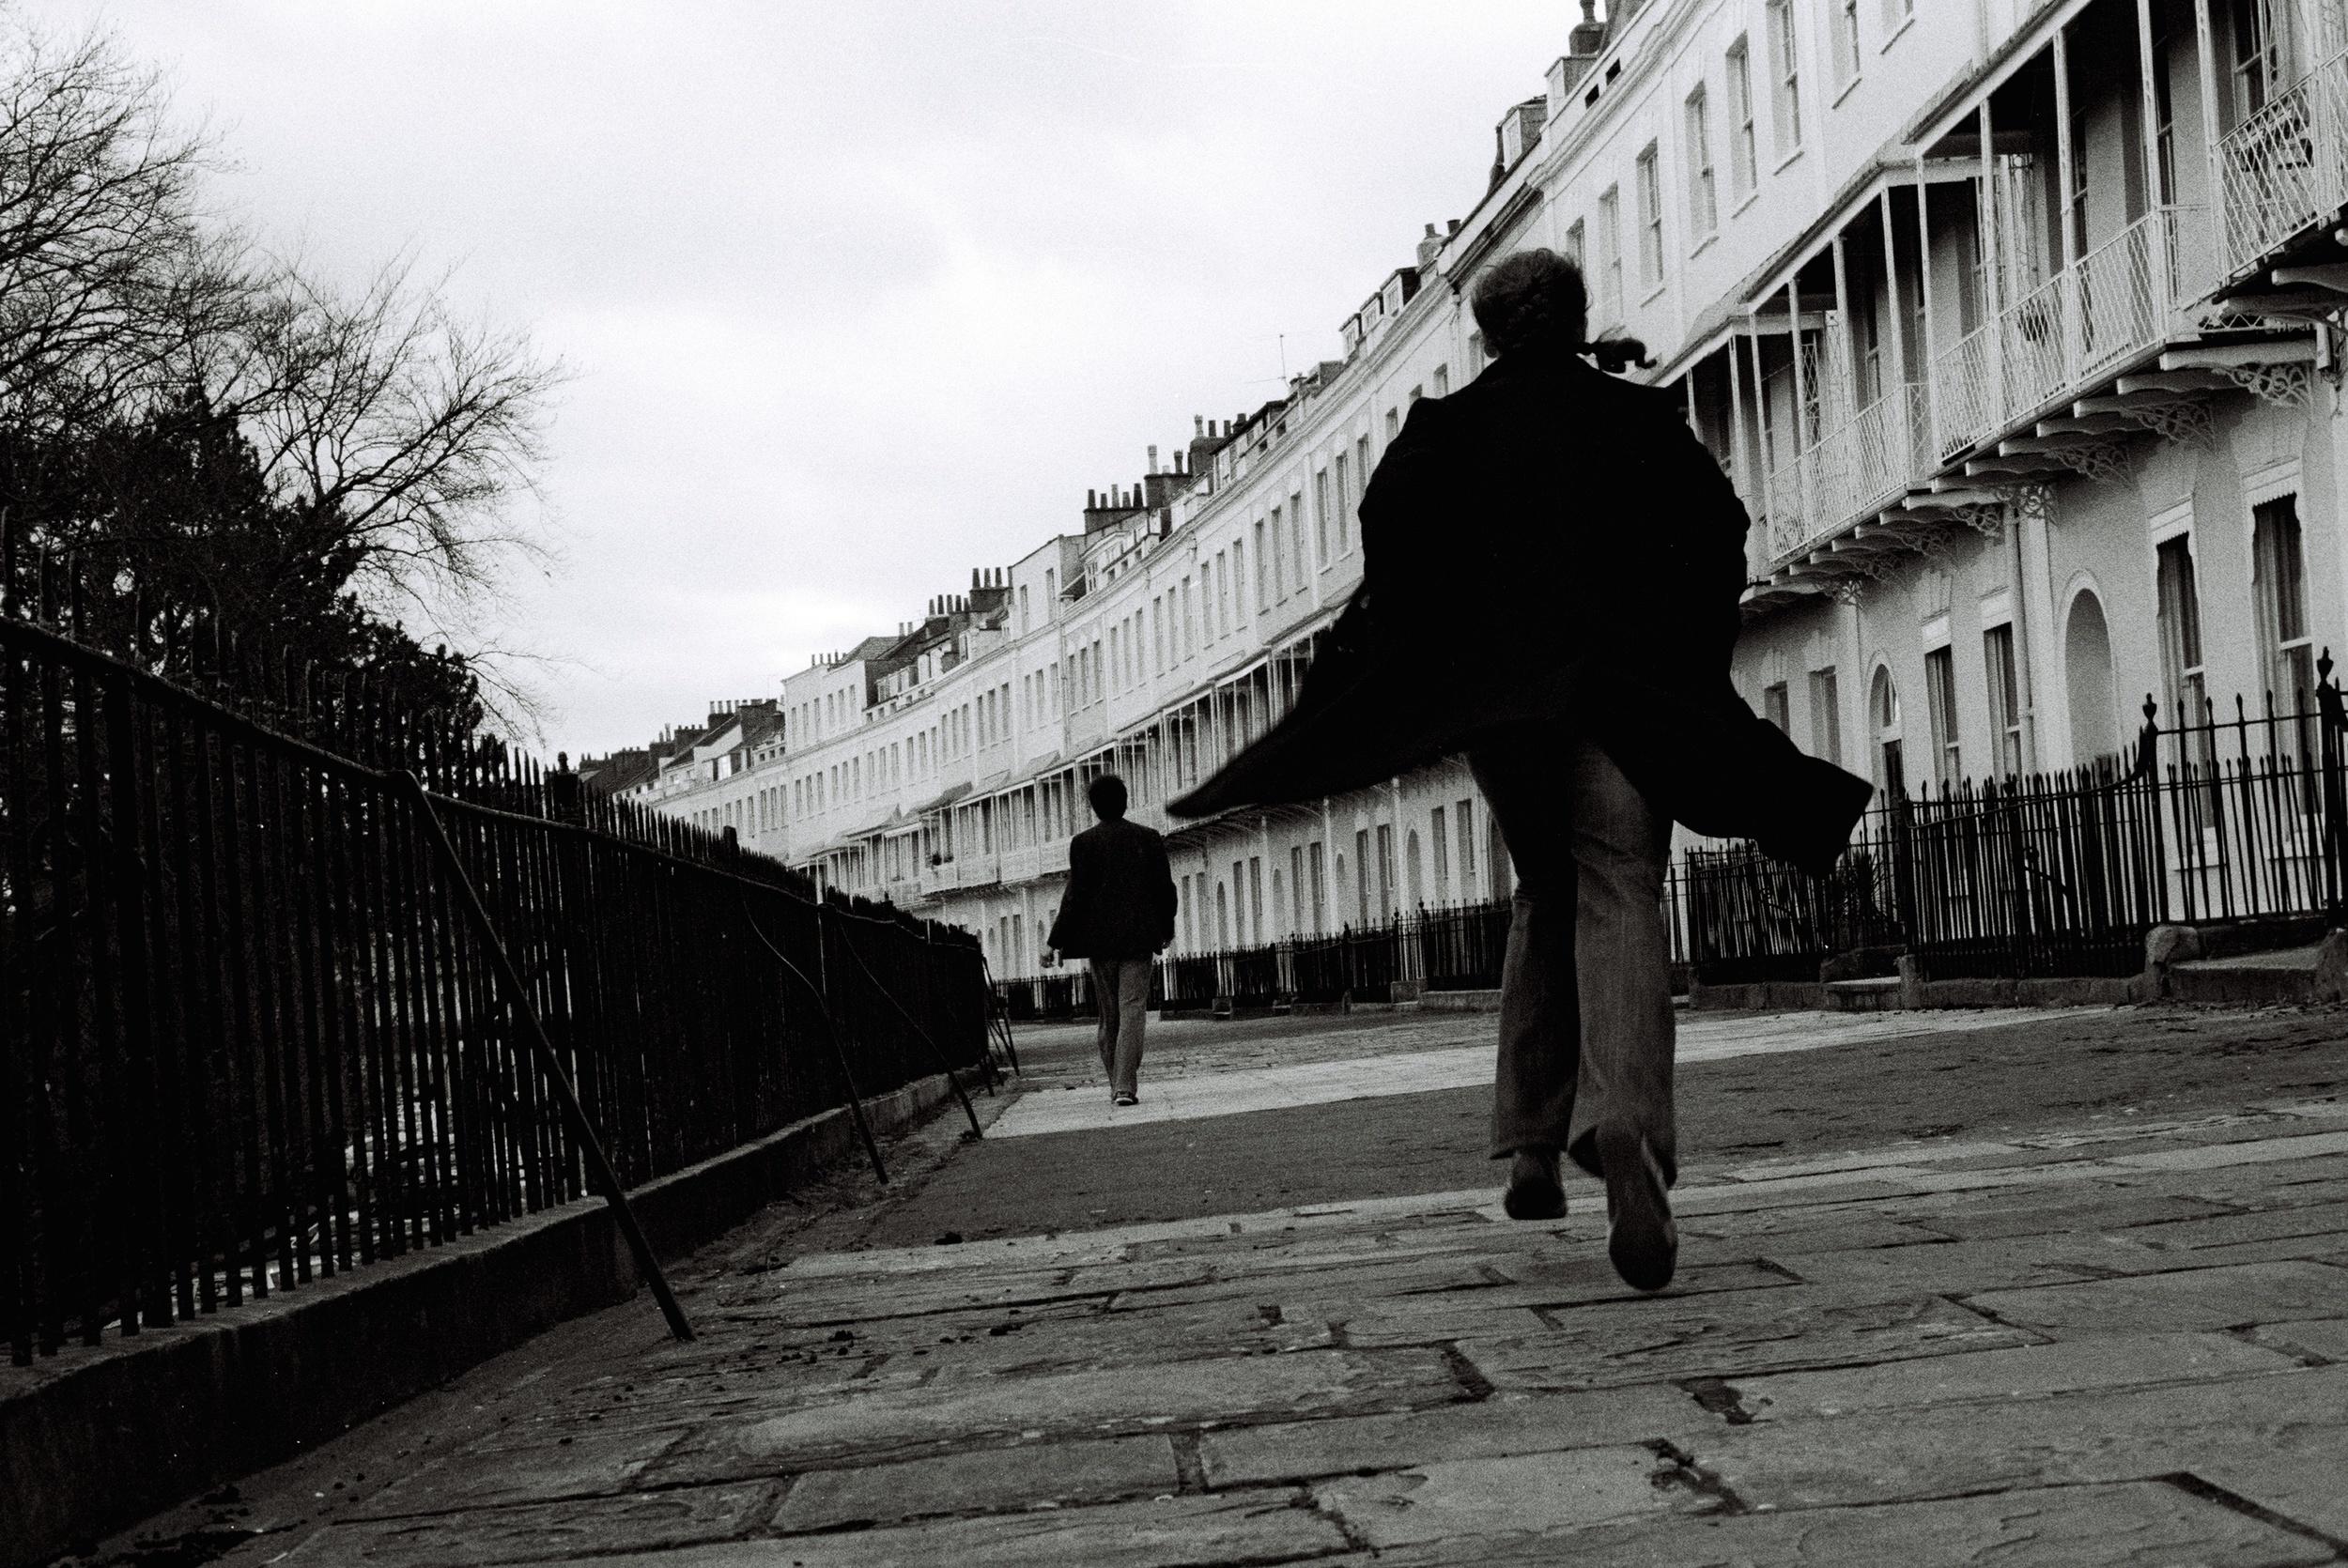 Bristol Promenade